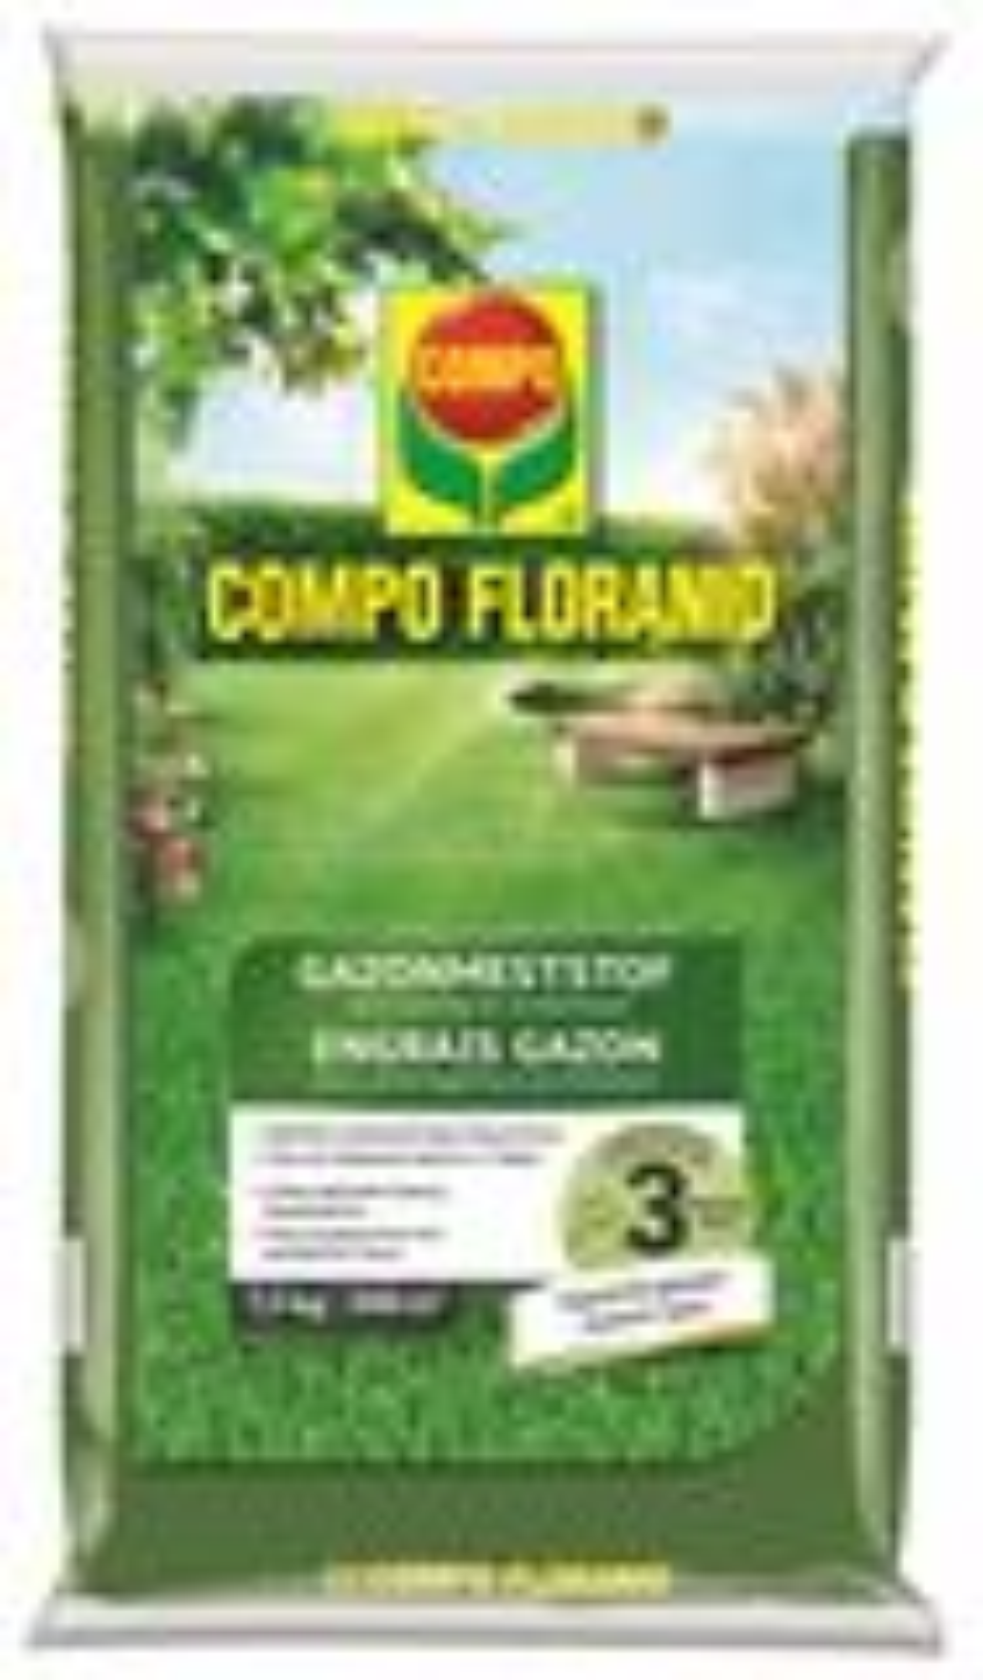 Compo floranid gazonmeststof voor aanleg & onderhoud - 7,5kg